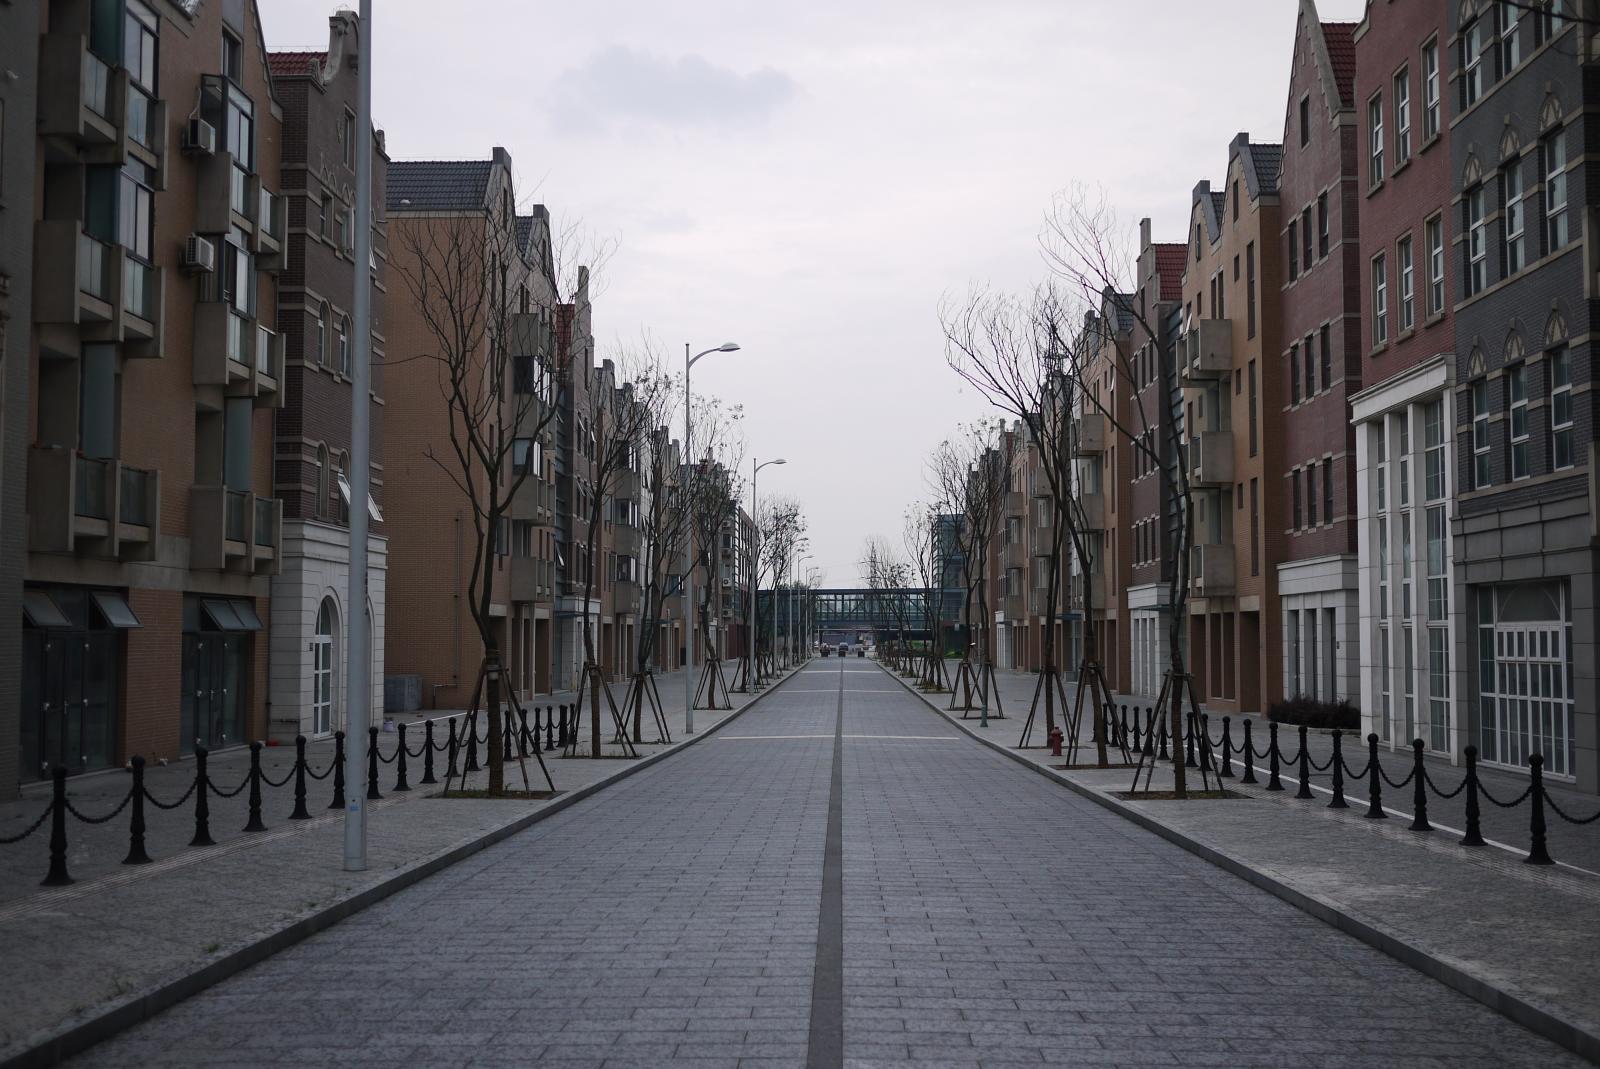 Black Daisy Wallpaper File Street In Holland Village Jpg Wikimedia Commons